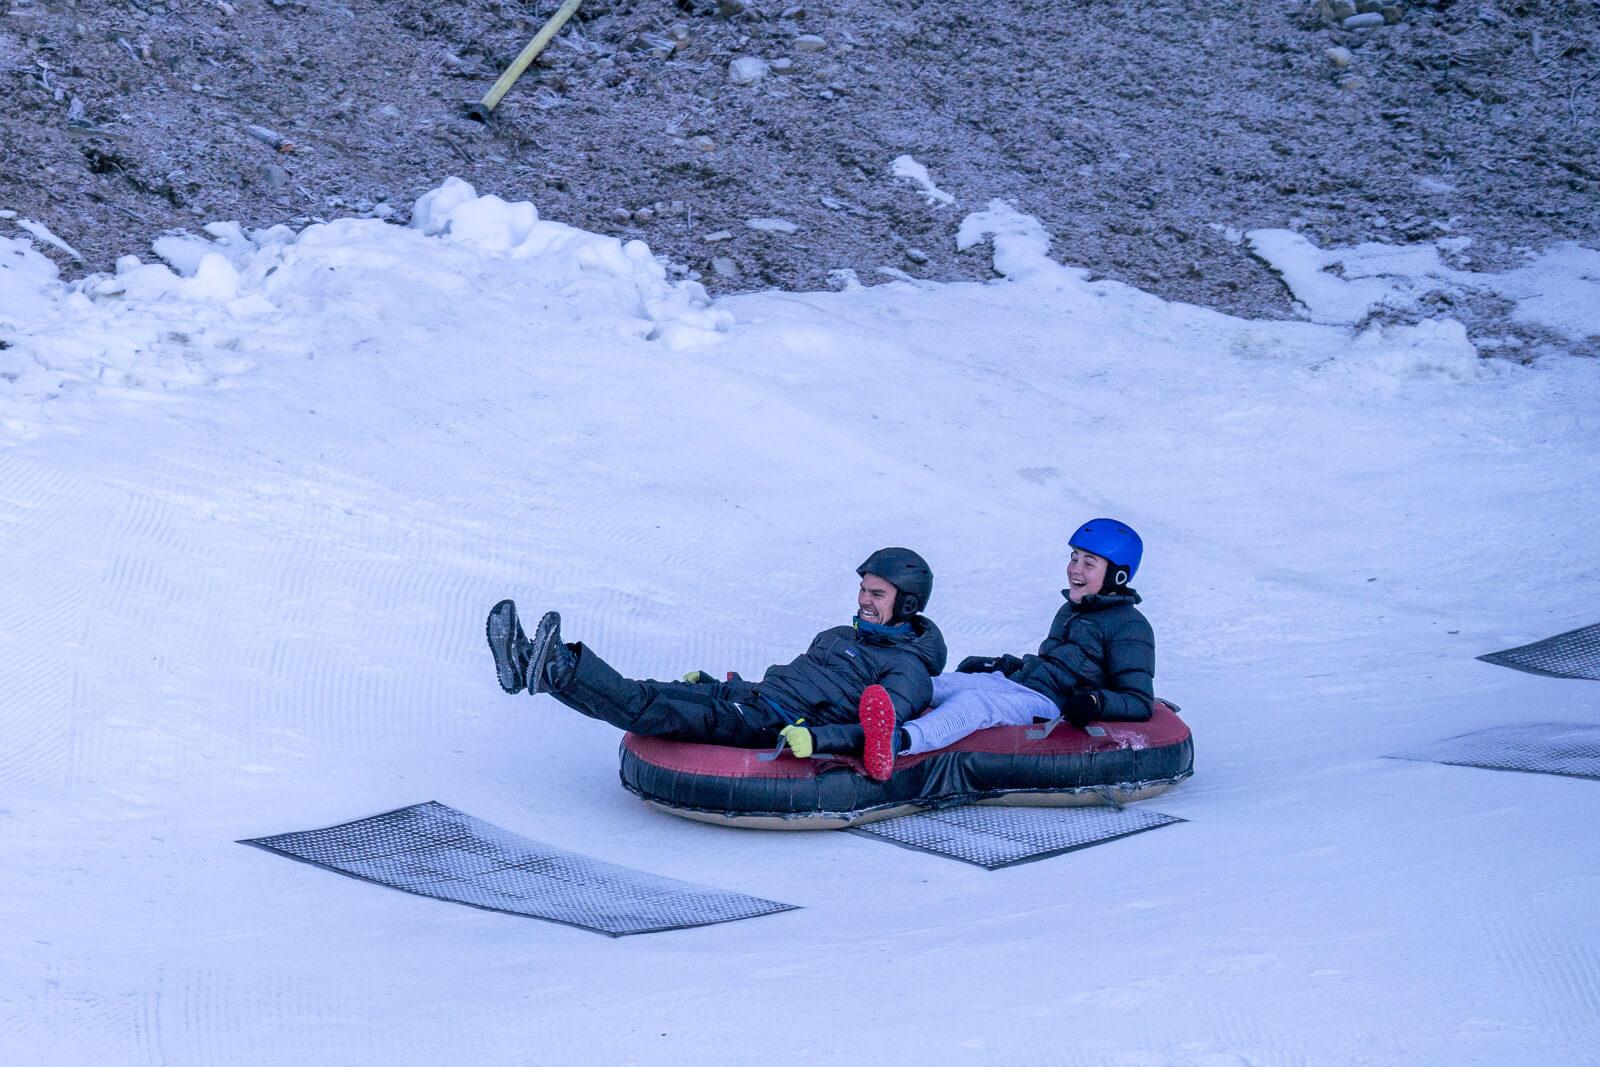 tweens snow tubing in tekapo